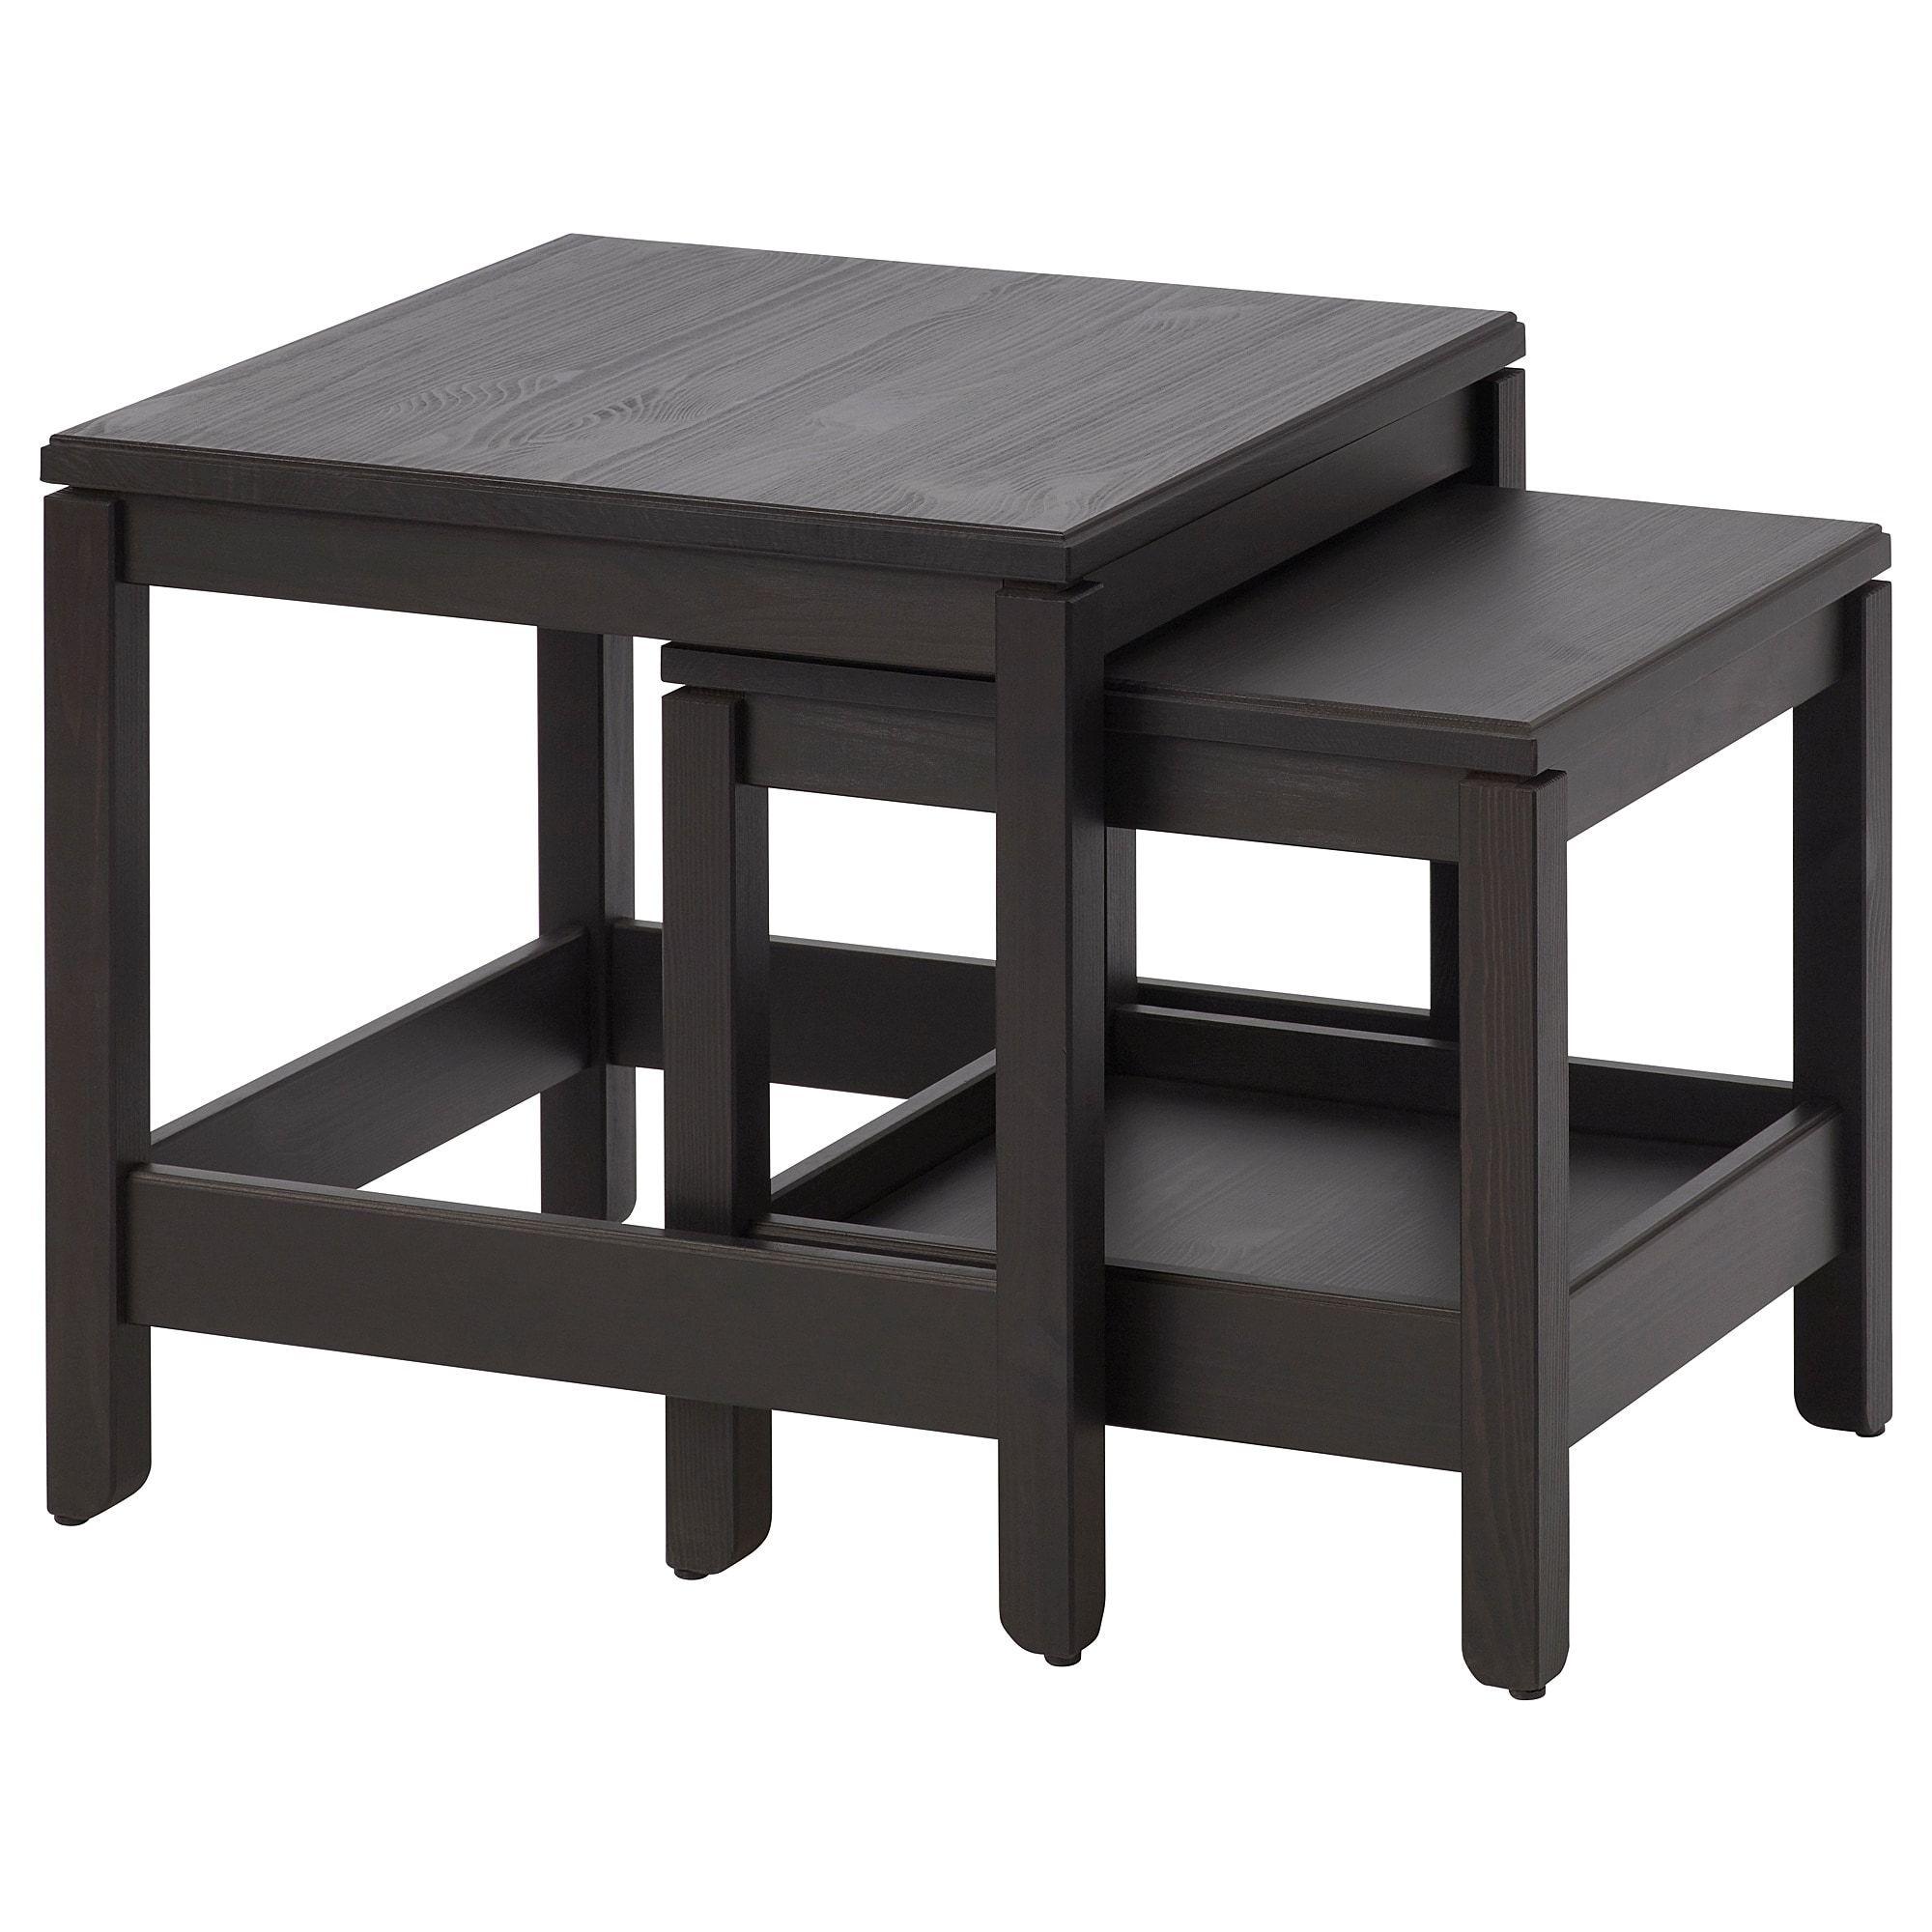 Havsta Nesting Tables Set Of 2 Dark Brown Ikea Nesting Tables Coffee Table Ikea [ 2000 x 2000 Pixel ]